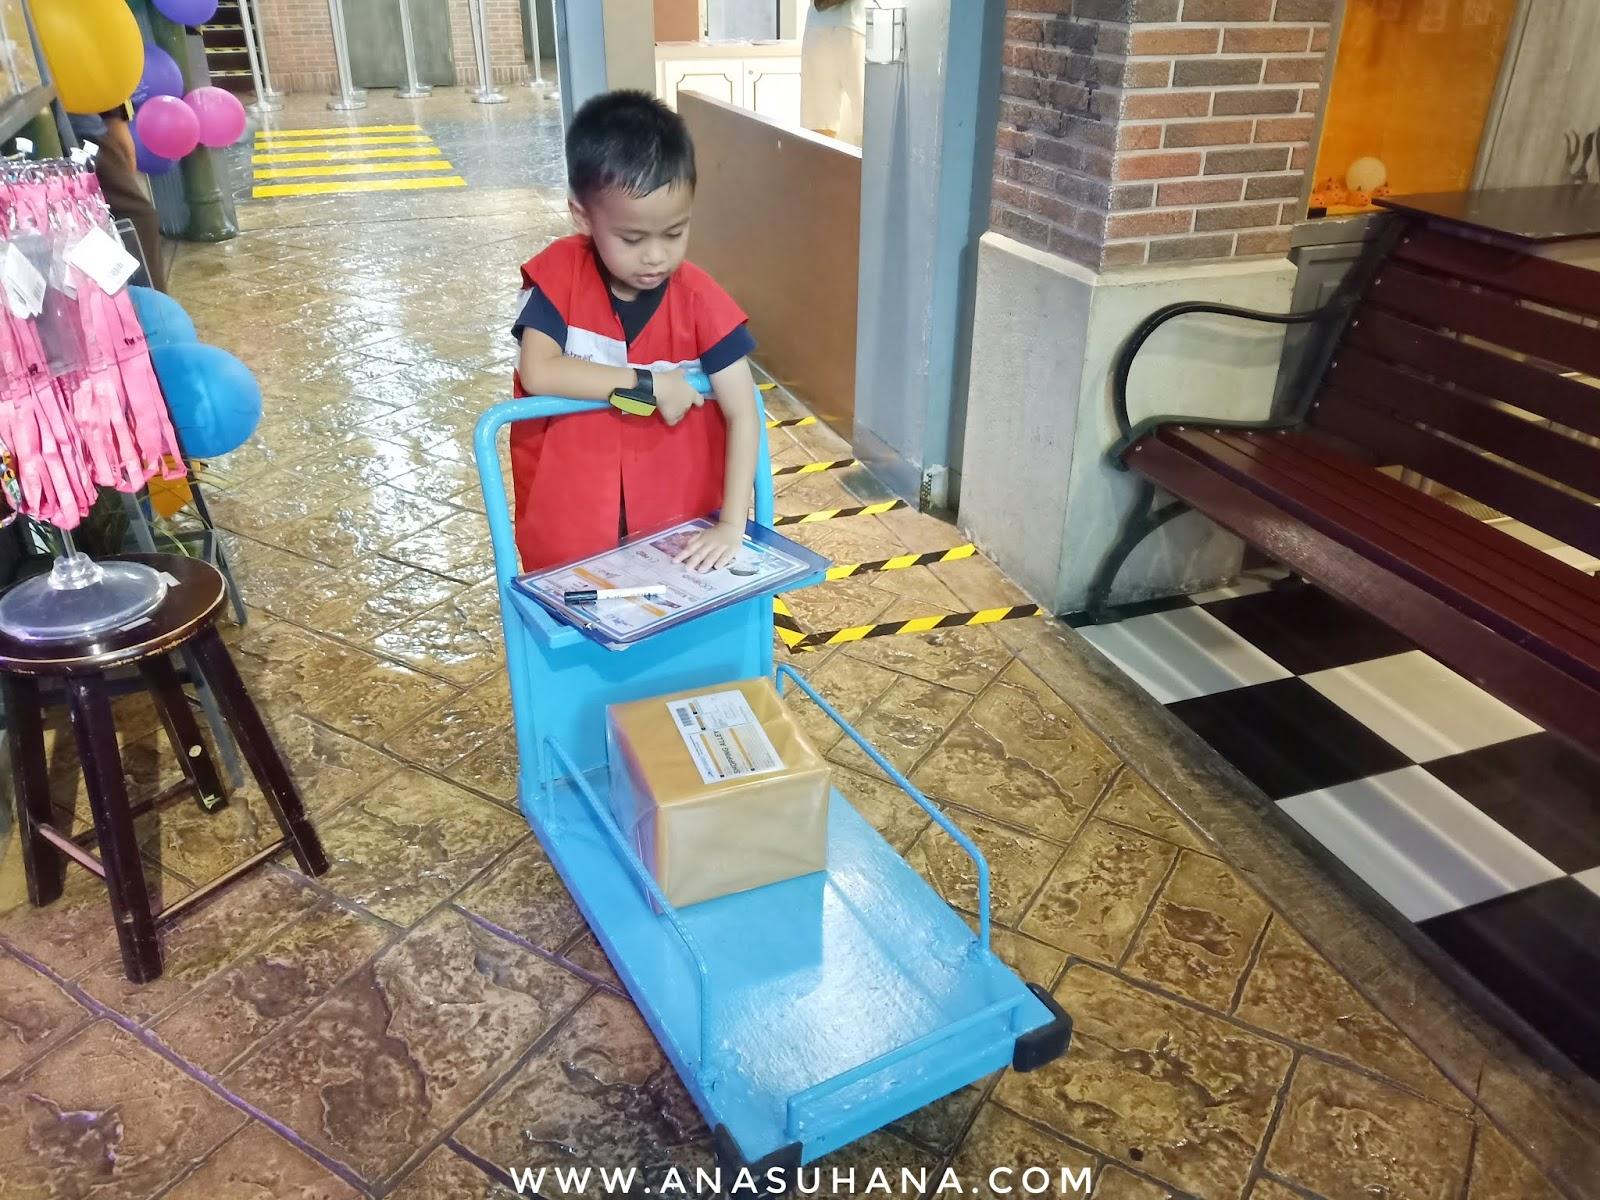 Mendidik Anak-anak Berbuat Baik Terhadap Orang Lain